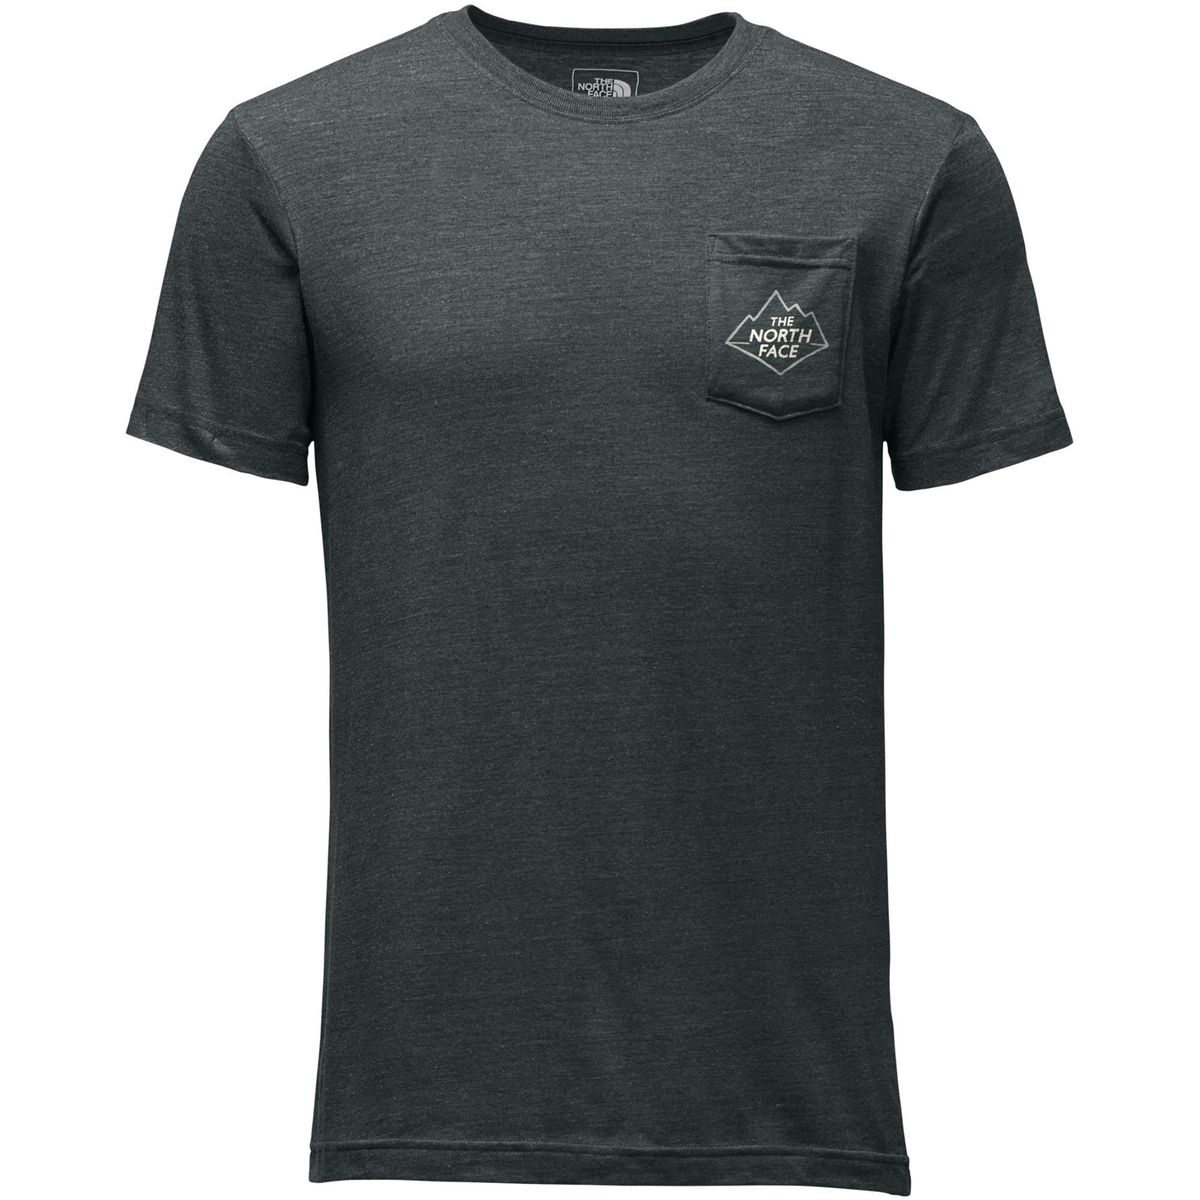 The North Face Peek Geek Tri-Blend Pocket T-Shirt - Men